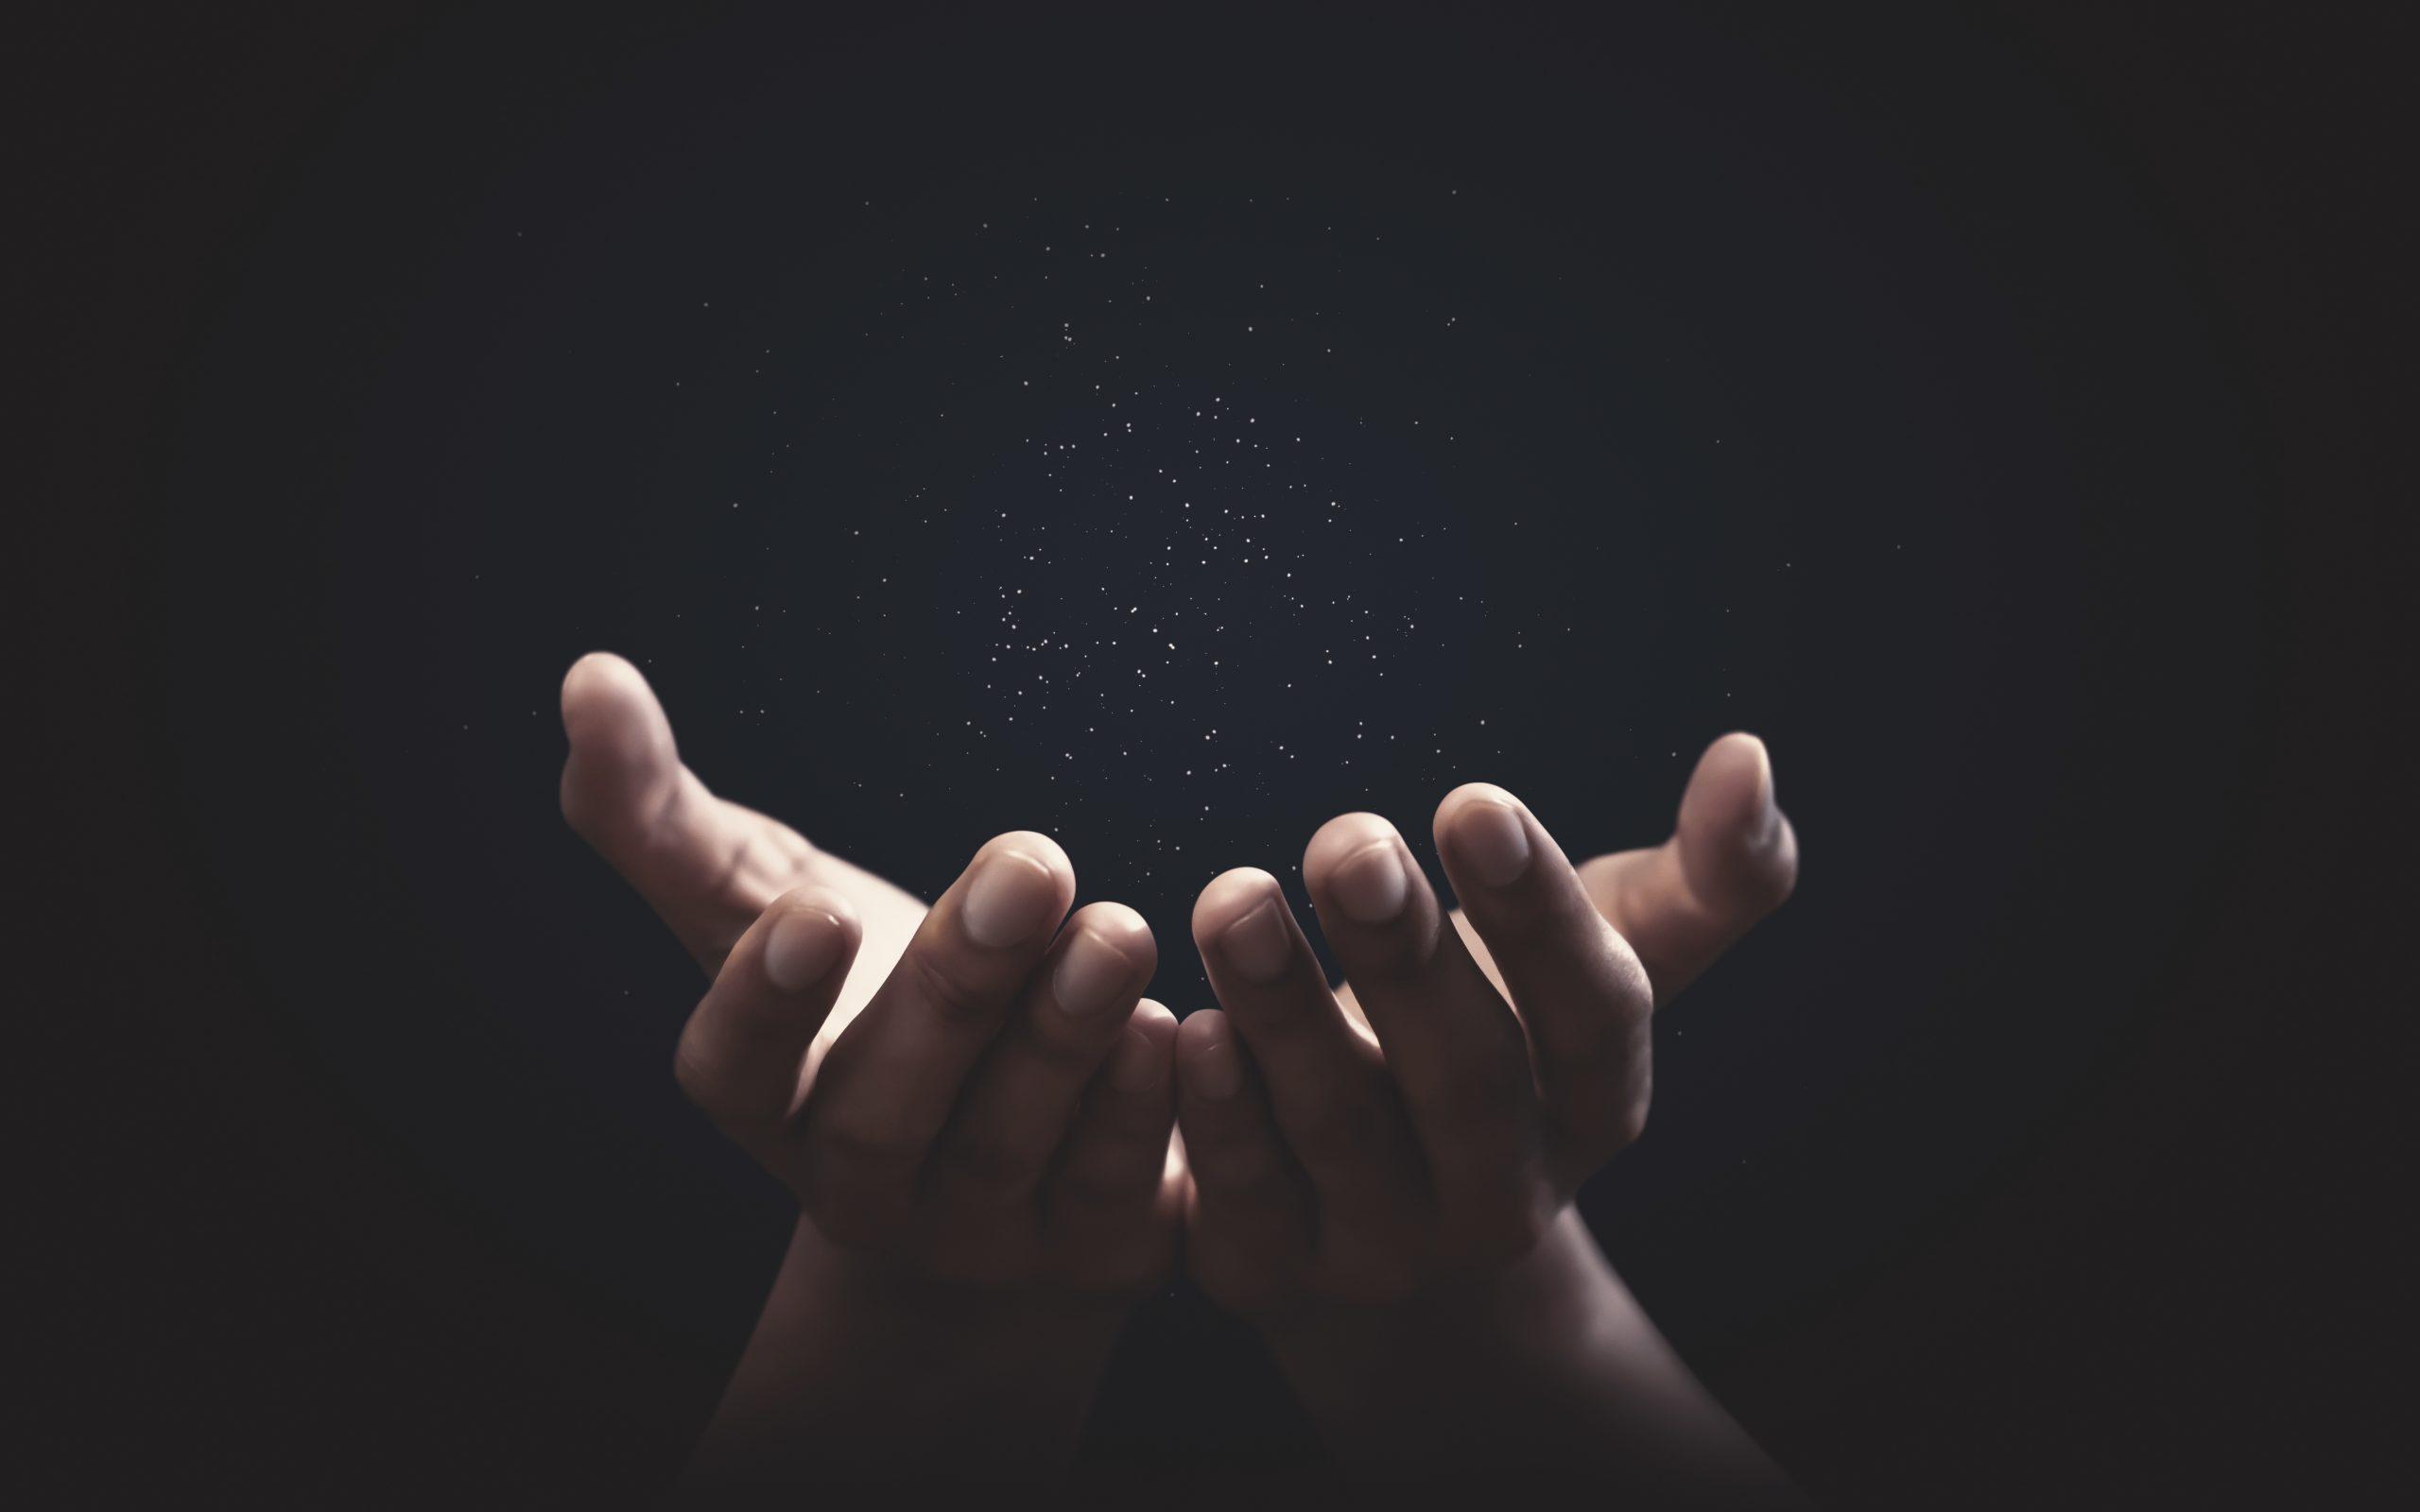 """Kekuatan dan Pemeliharaan Tuhan"" (Doa Berkat)"